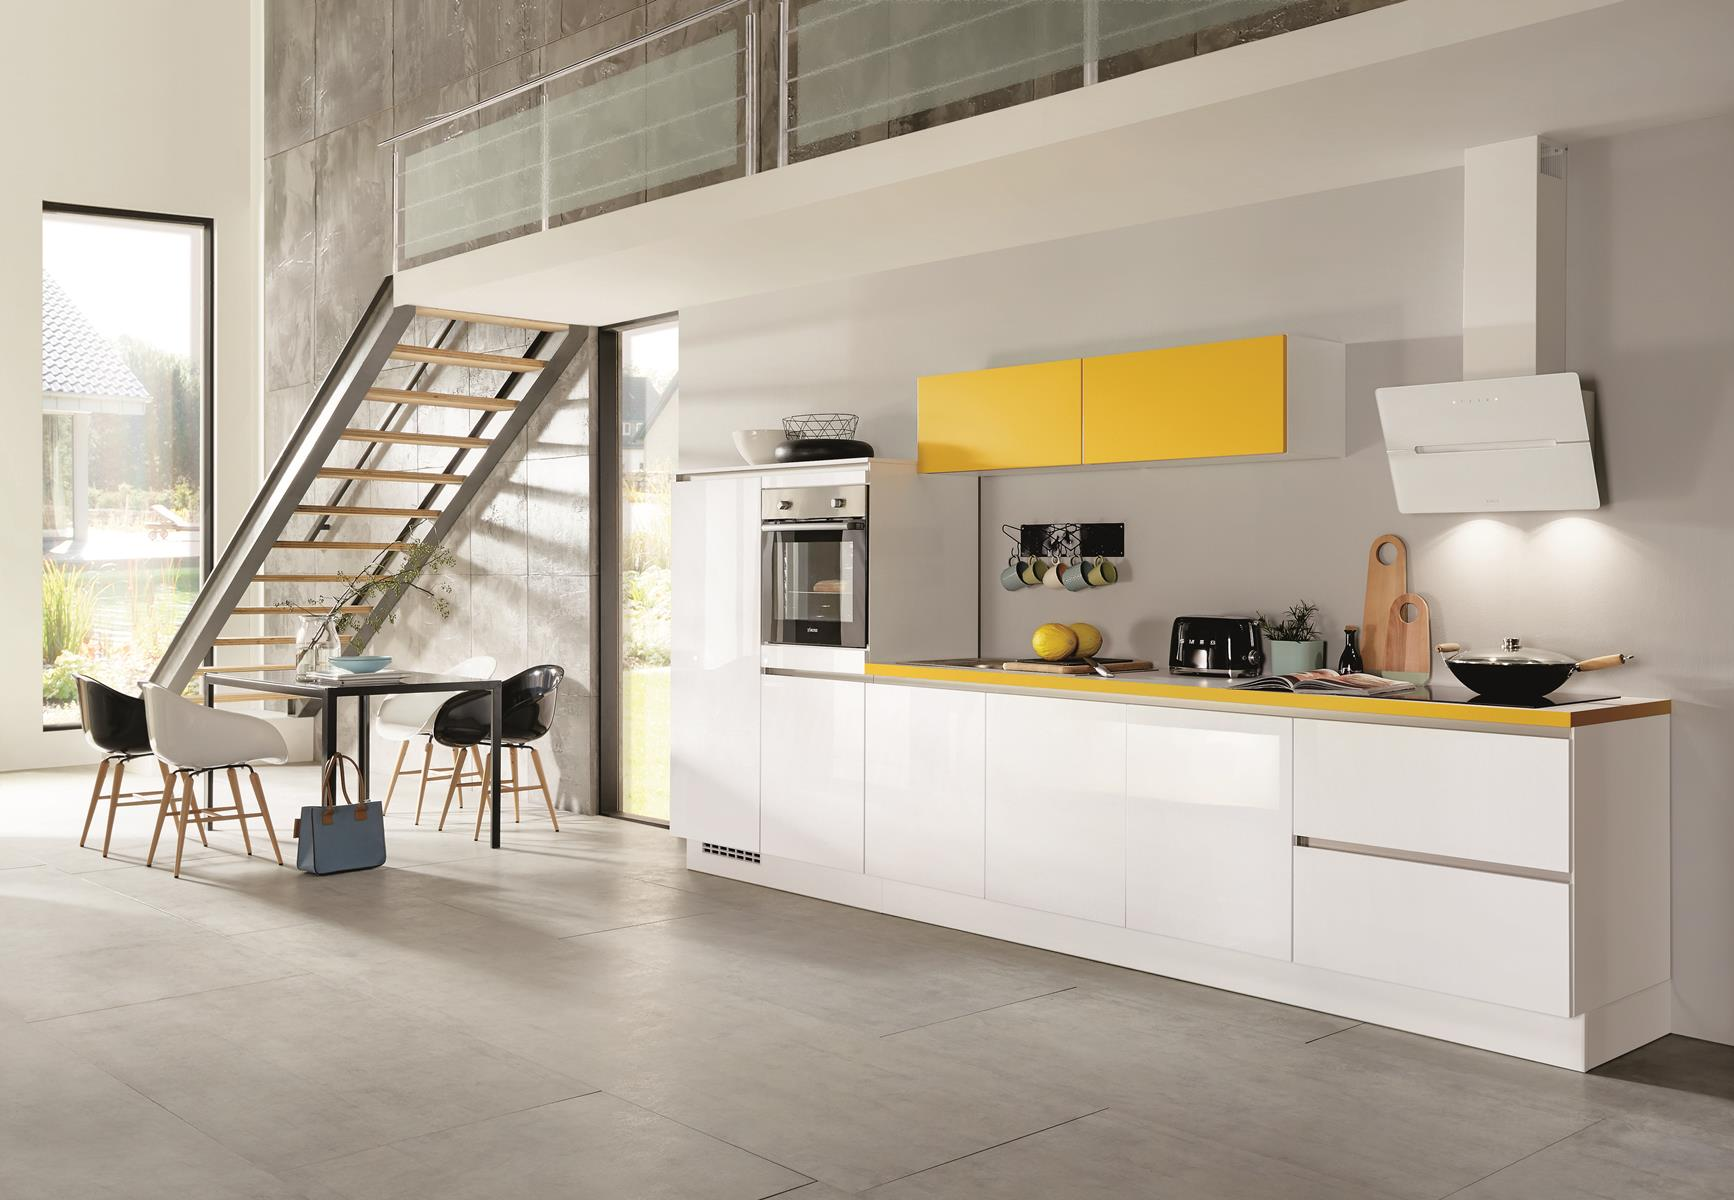 ideas para cocinas en espacios reducidos